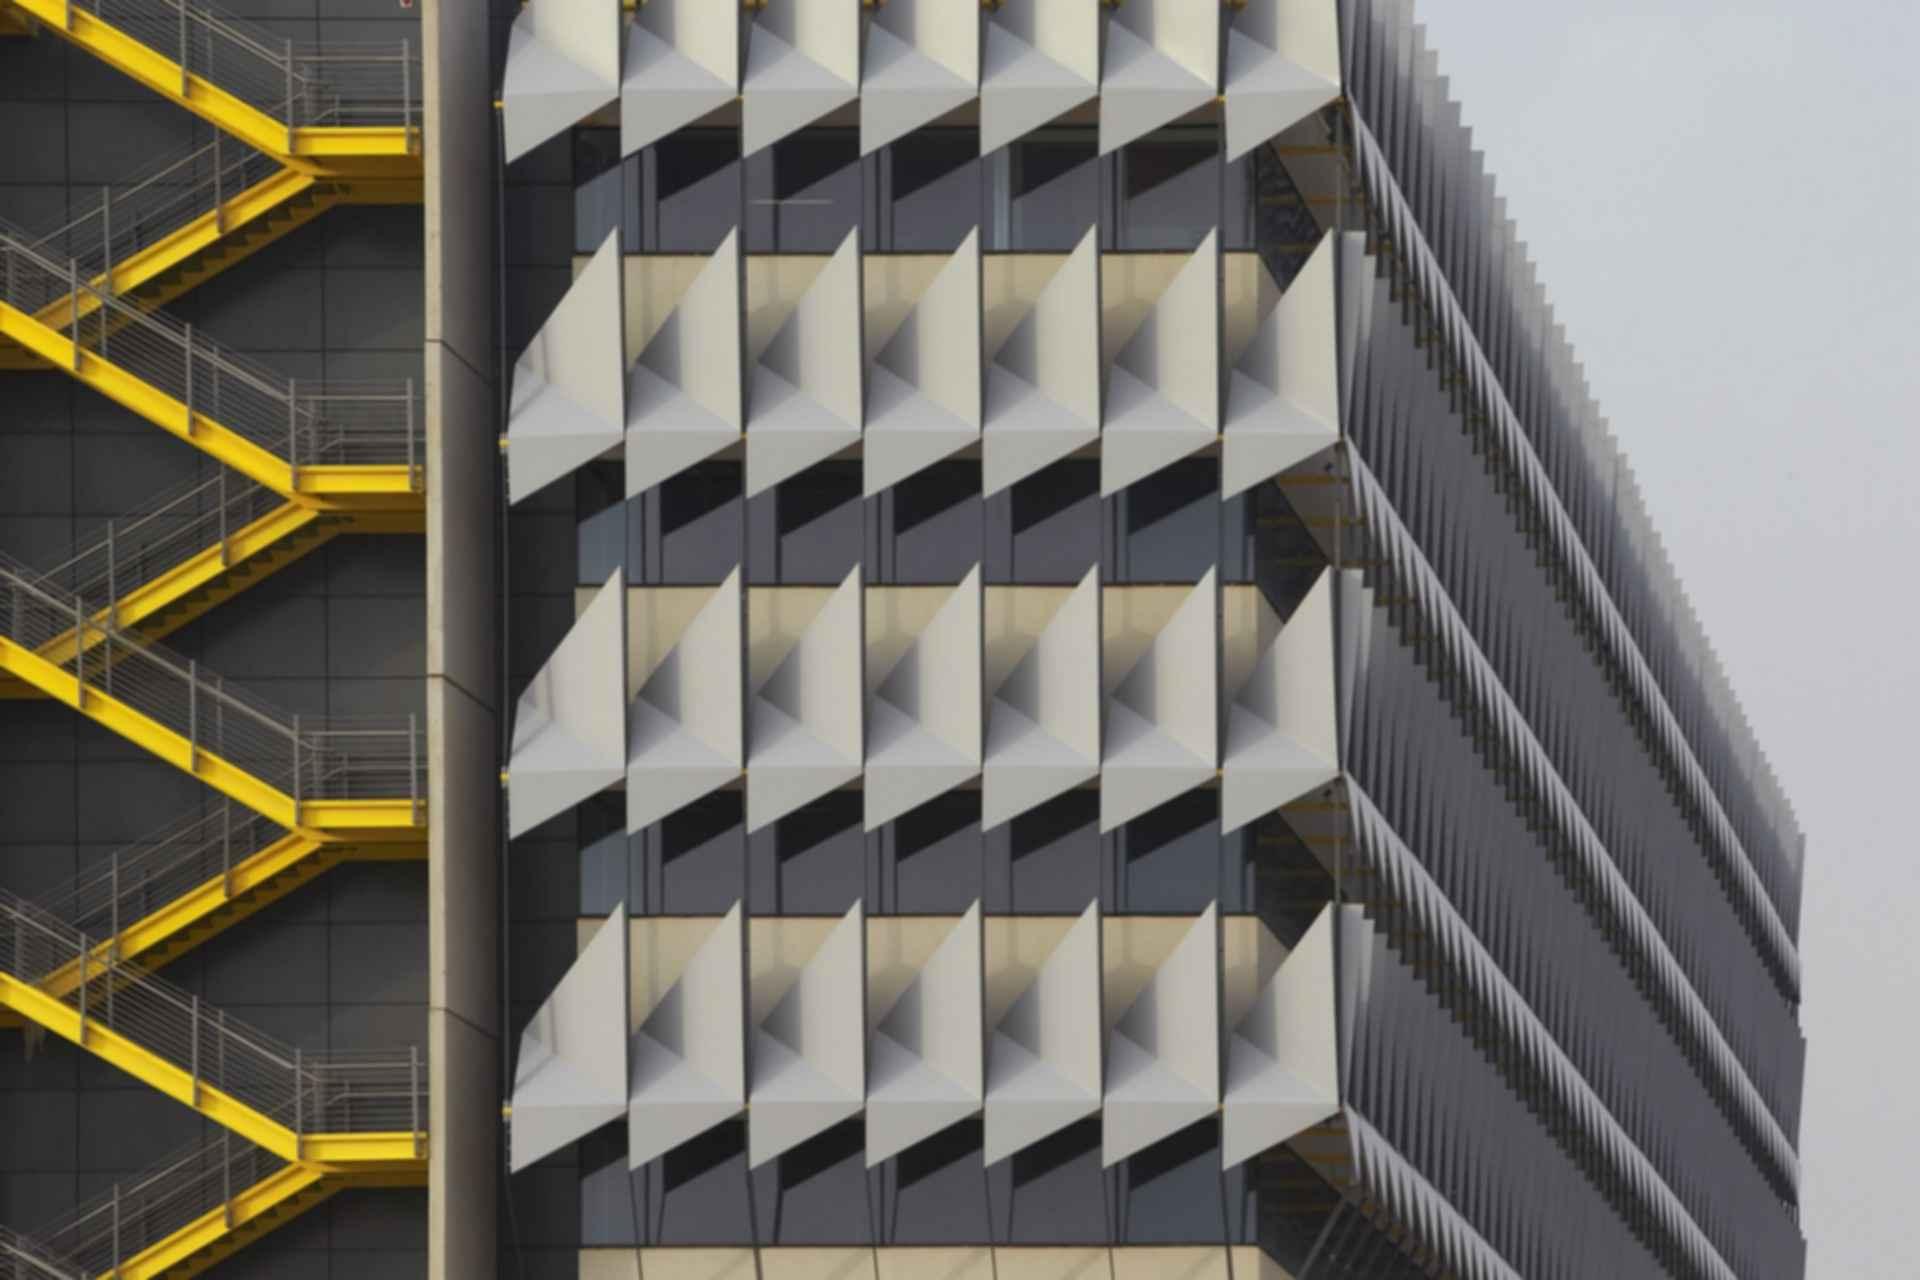 Siemens HQ in Masdar City - Exterior Shade/Stairs